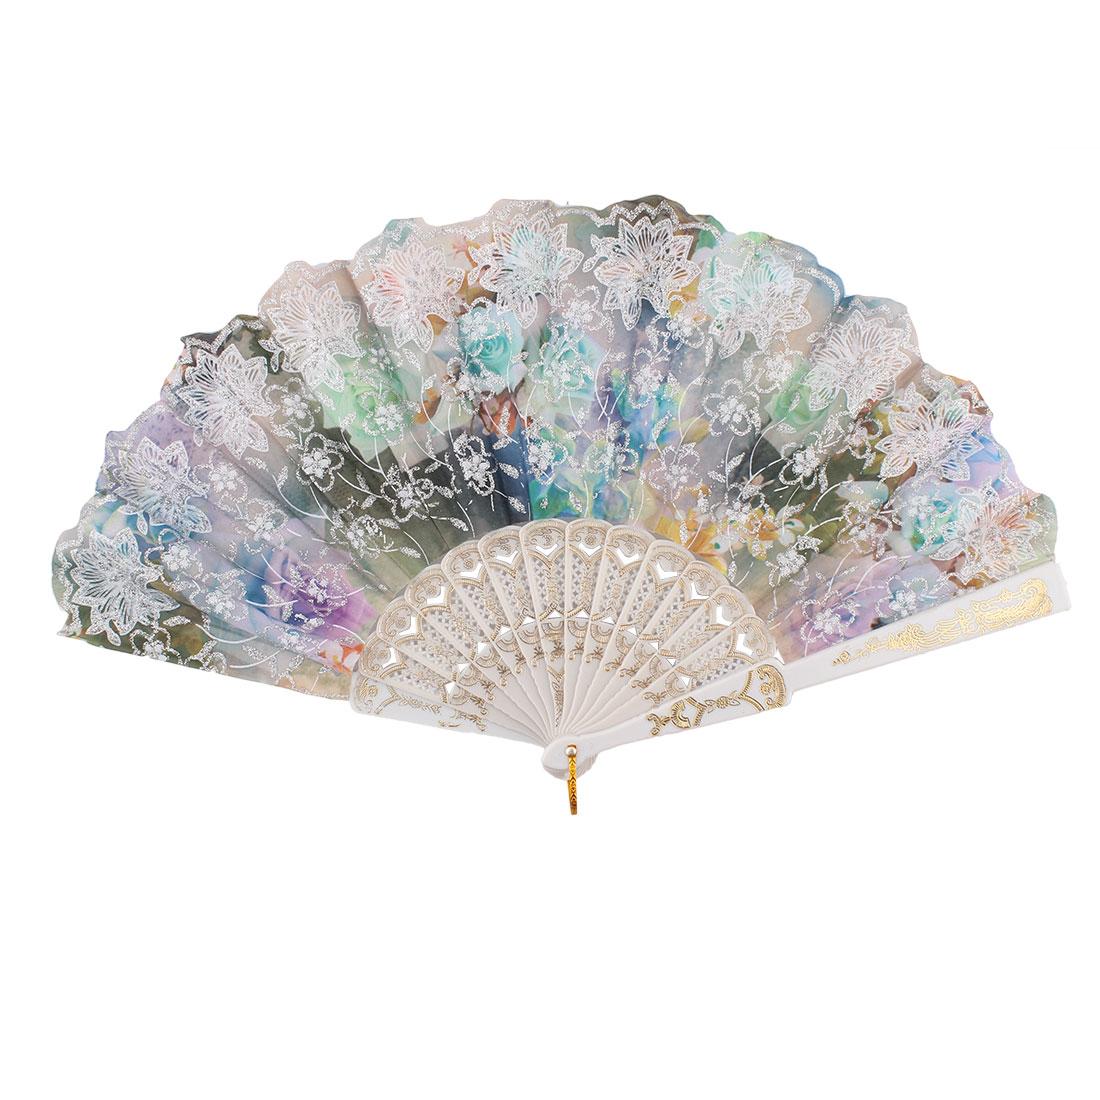 Chinese Style Glitter Powder Flower Pattern Wedding Decor Plastic Frame Nylon Fabric Summer Folding Hand Fan